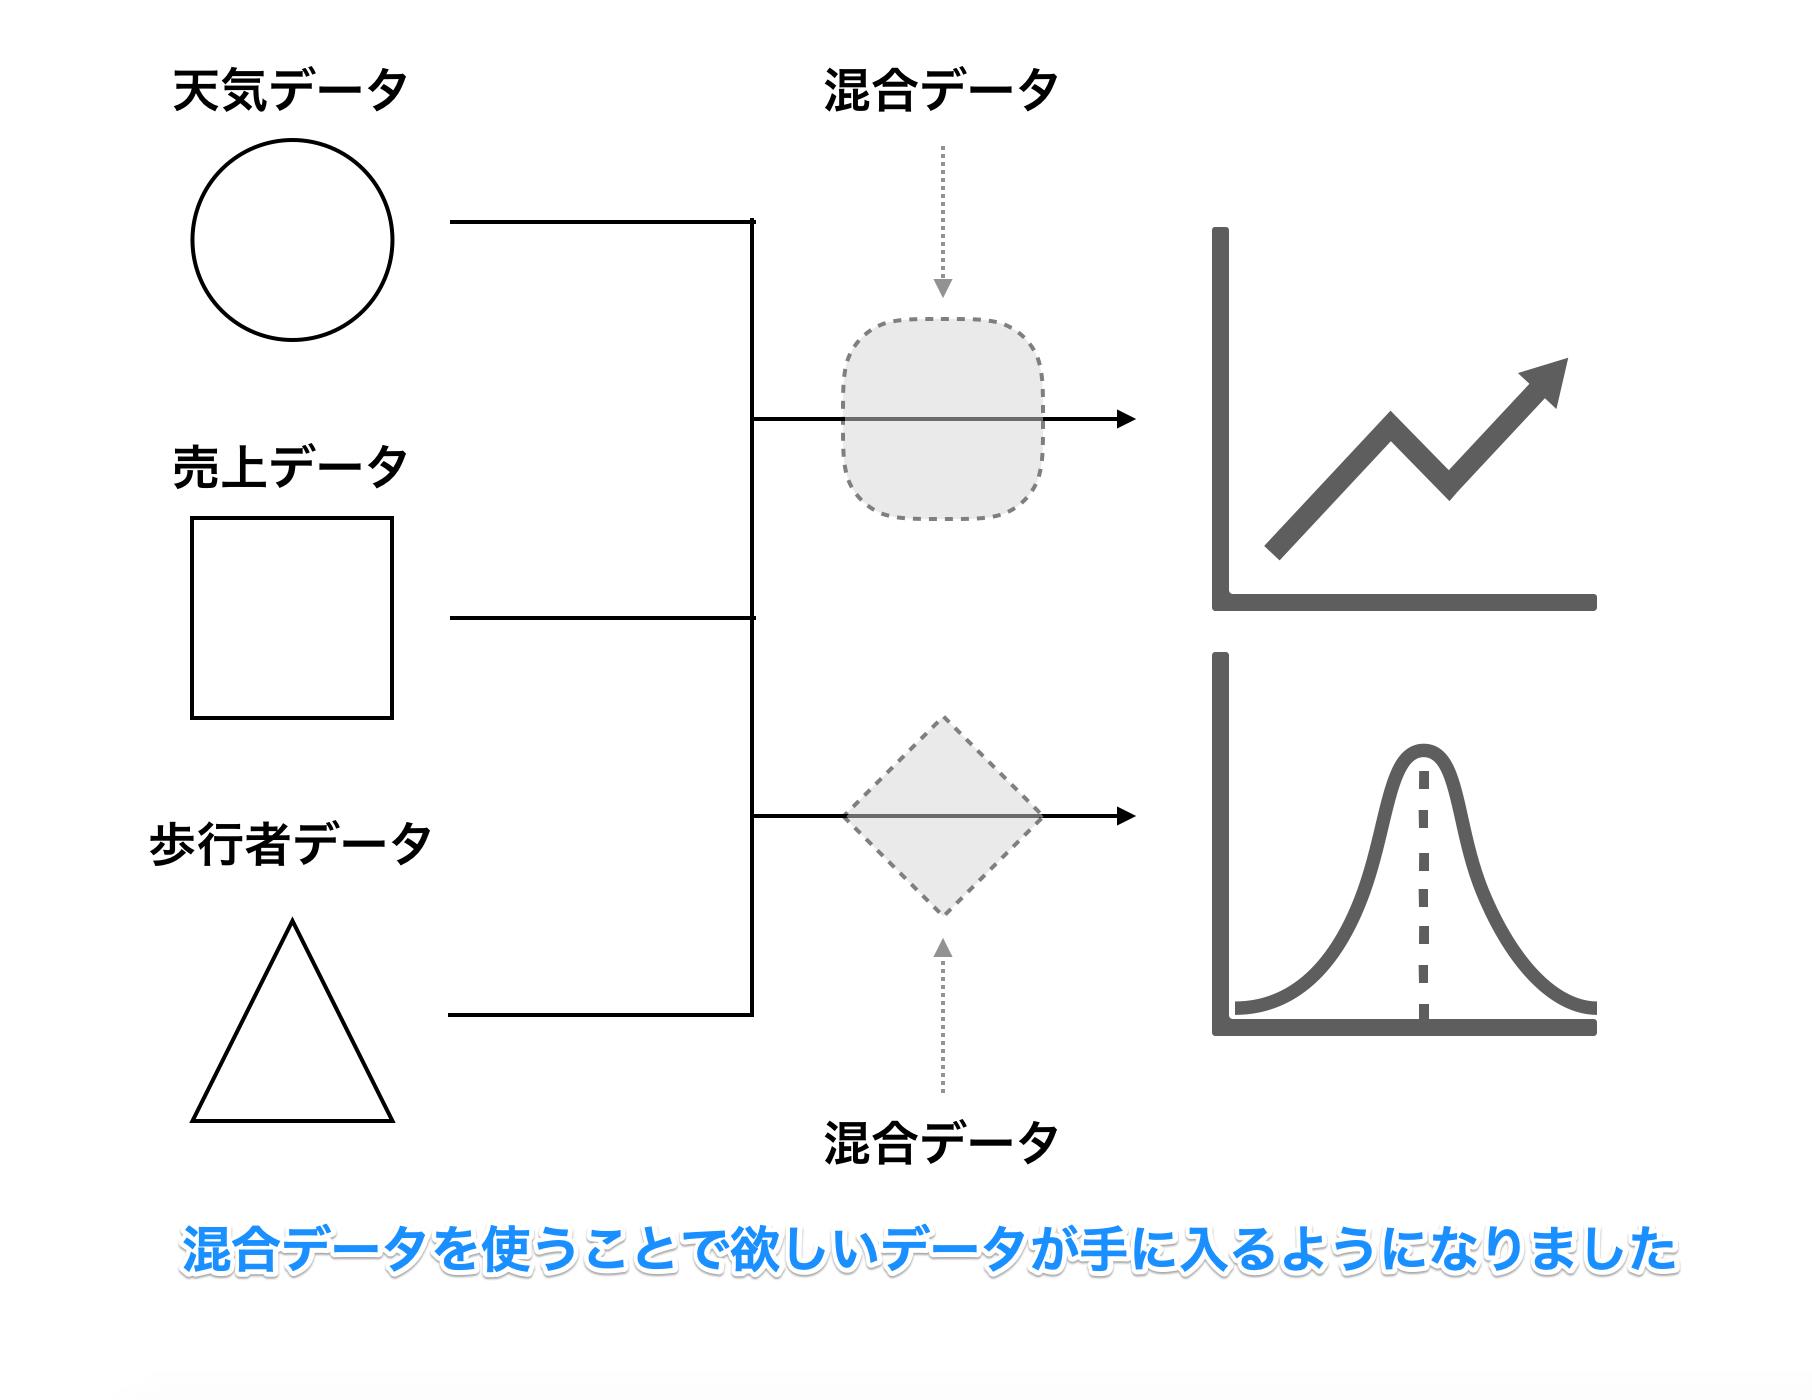 【Googleデータポータル】サンプルで実践!混合データと計算フィールドを組み合わせたグラフ作成